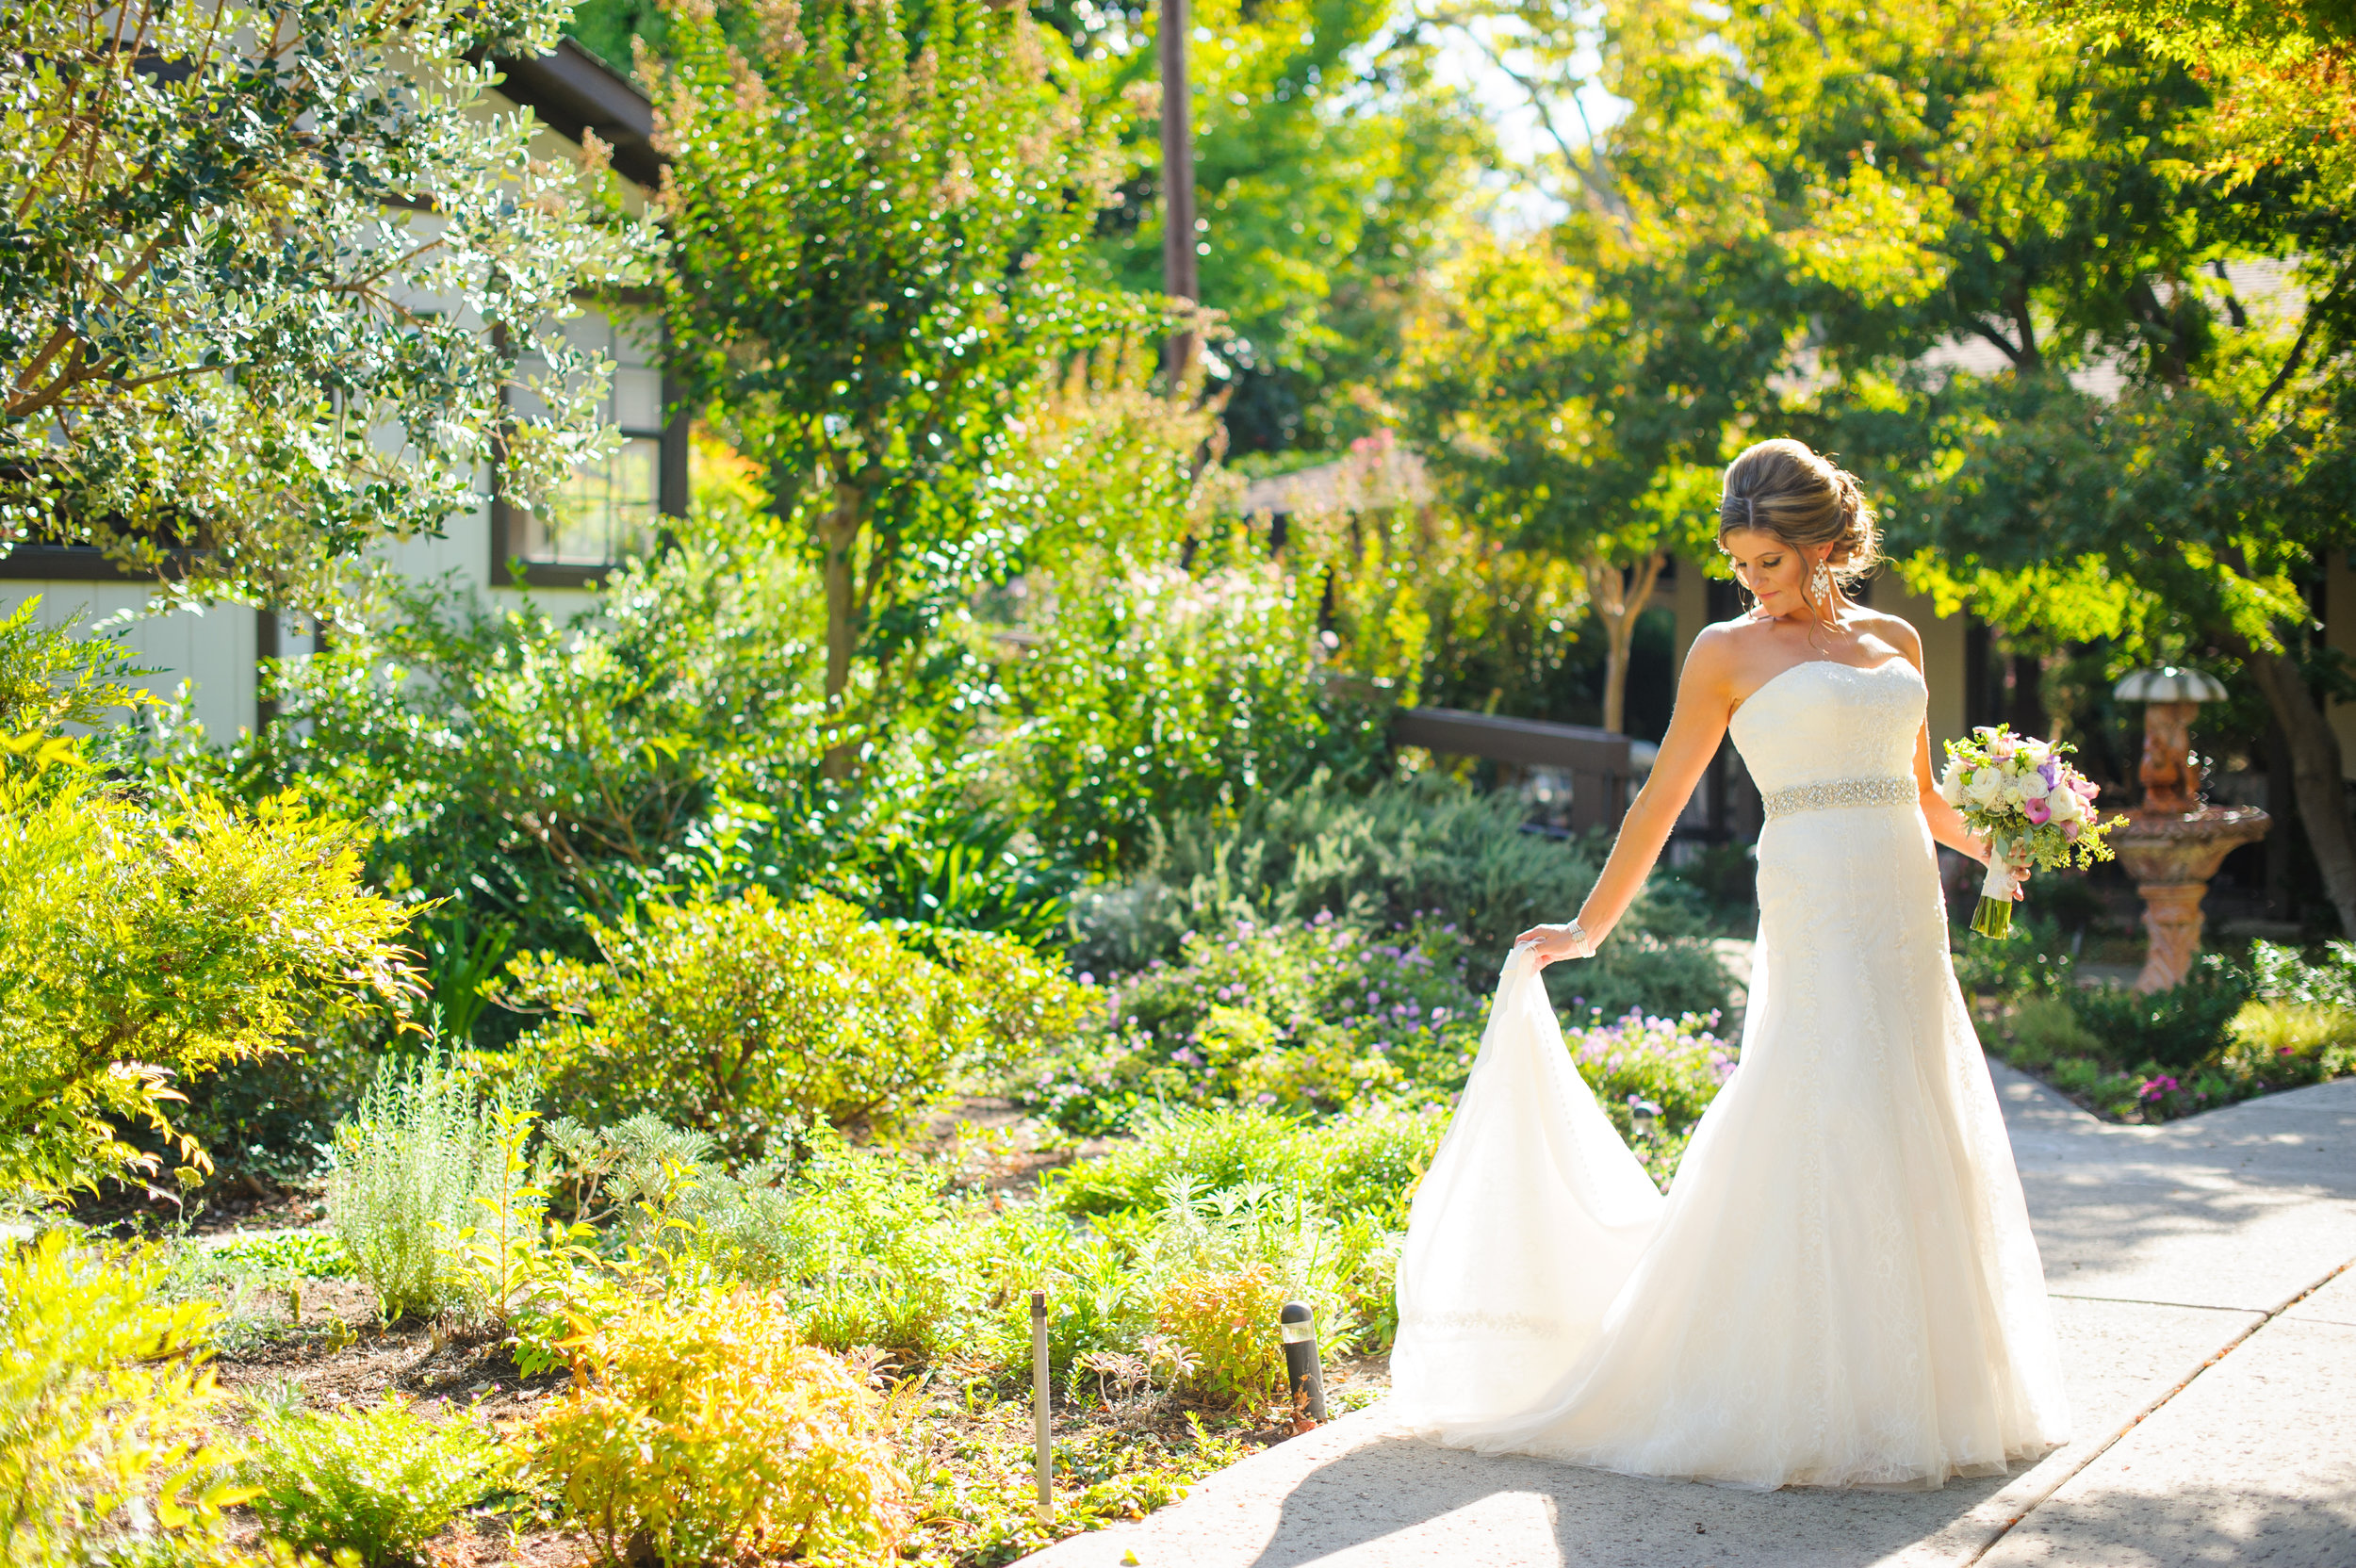 susan-brad-008-sacramento-wedding-photographer-katherine-nicole-photography.JPG